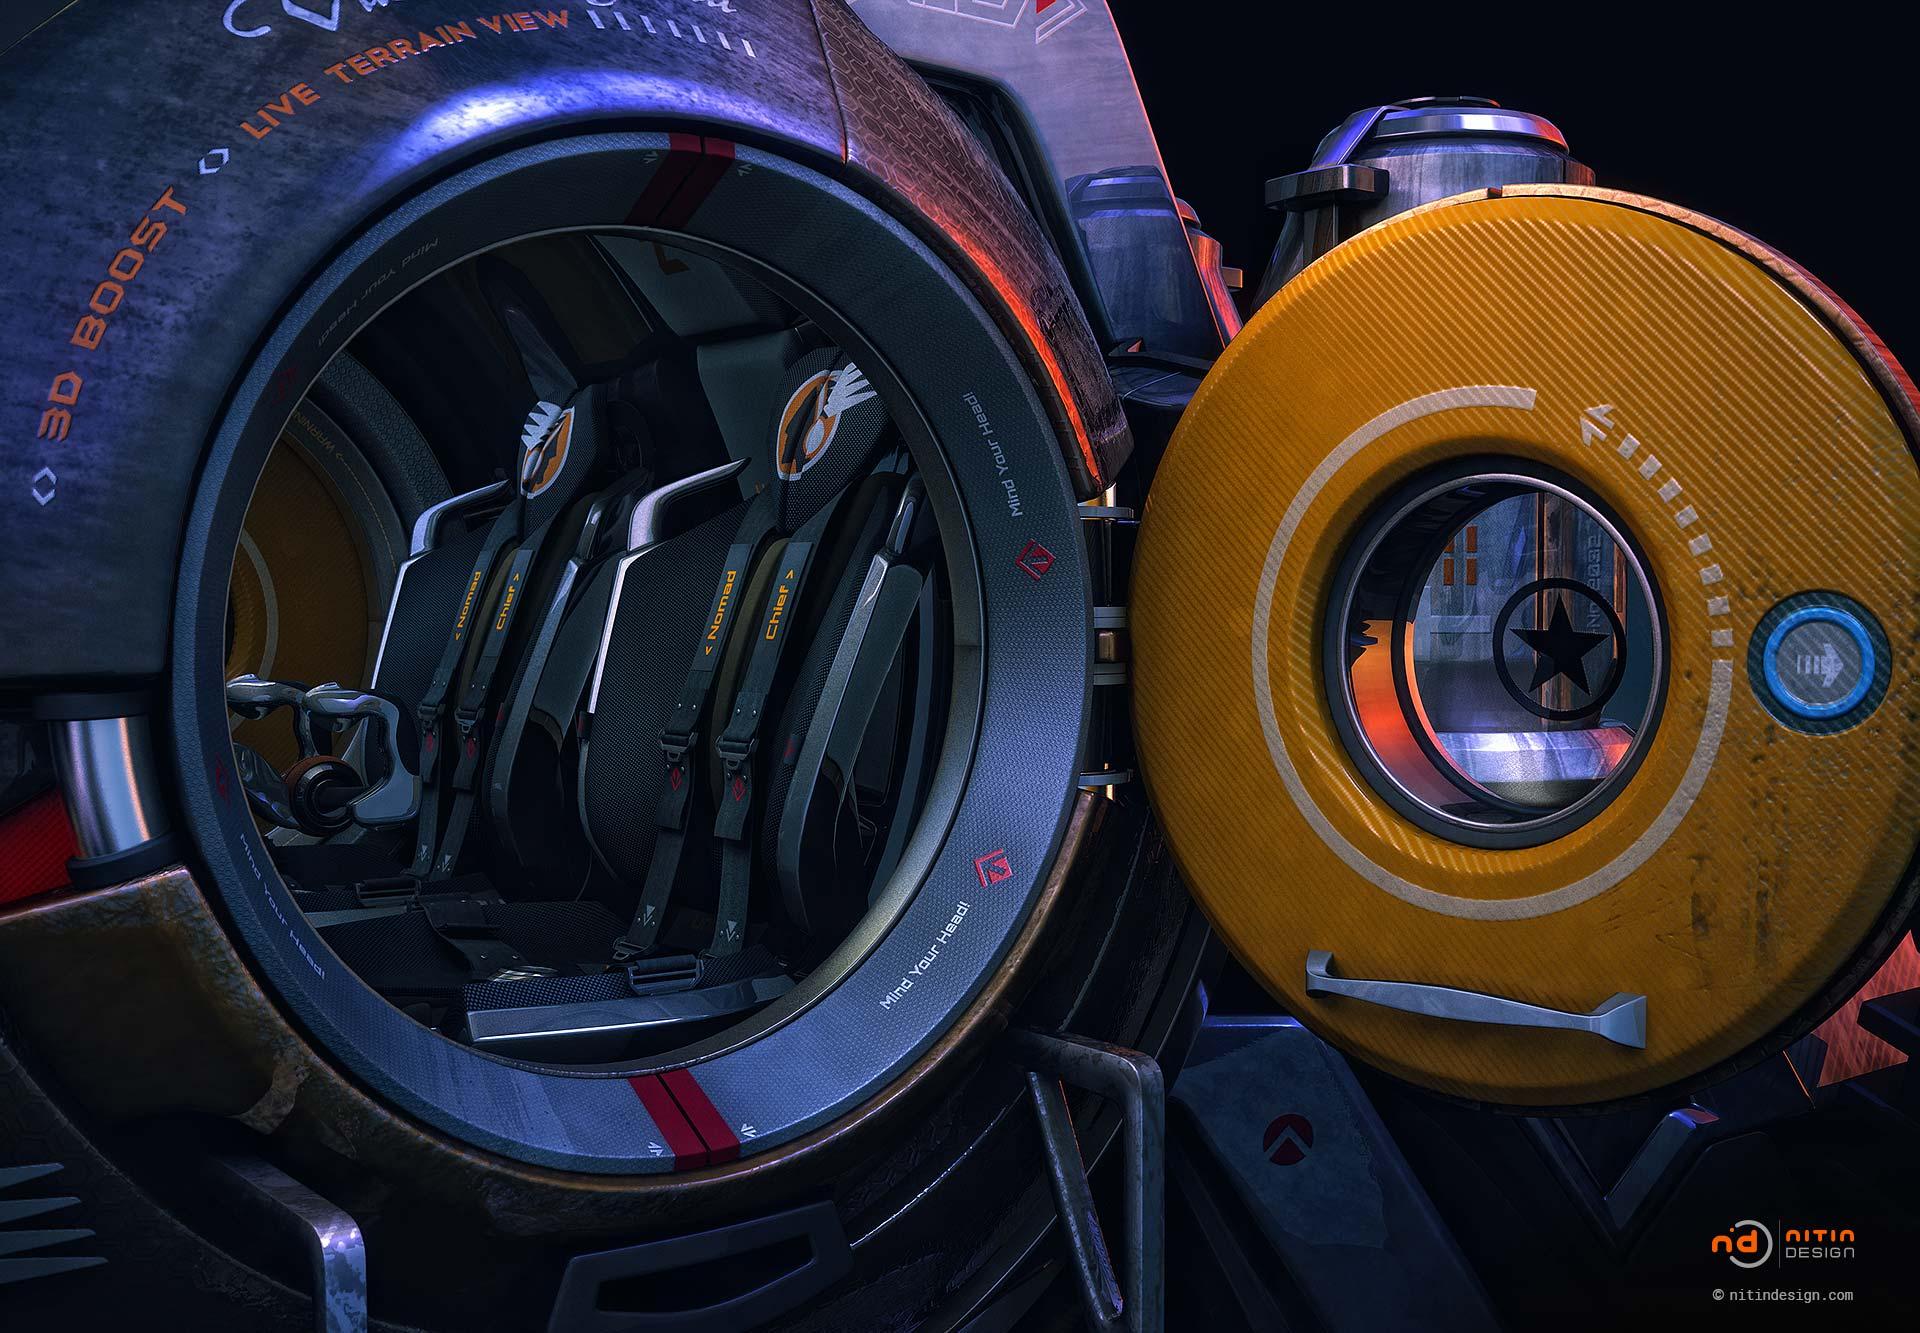 Nomad-Chief-Vehicle-Nitin-Design